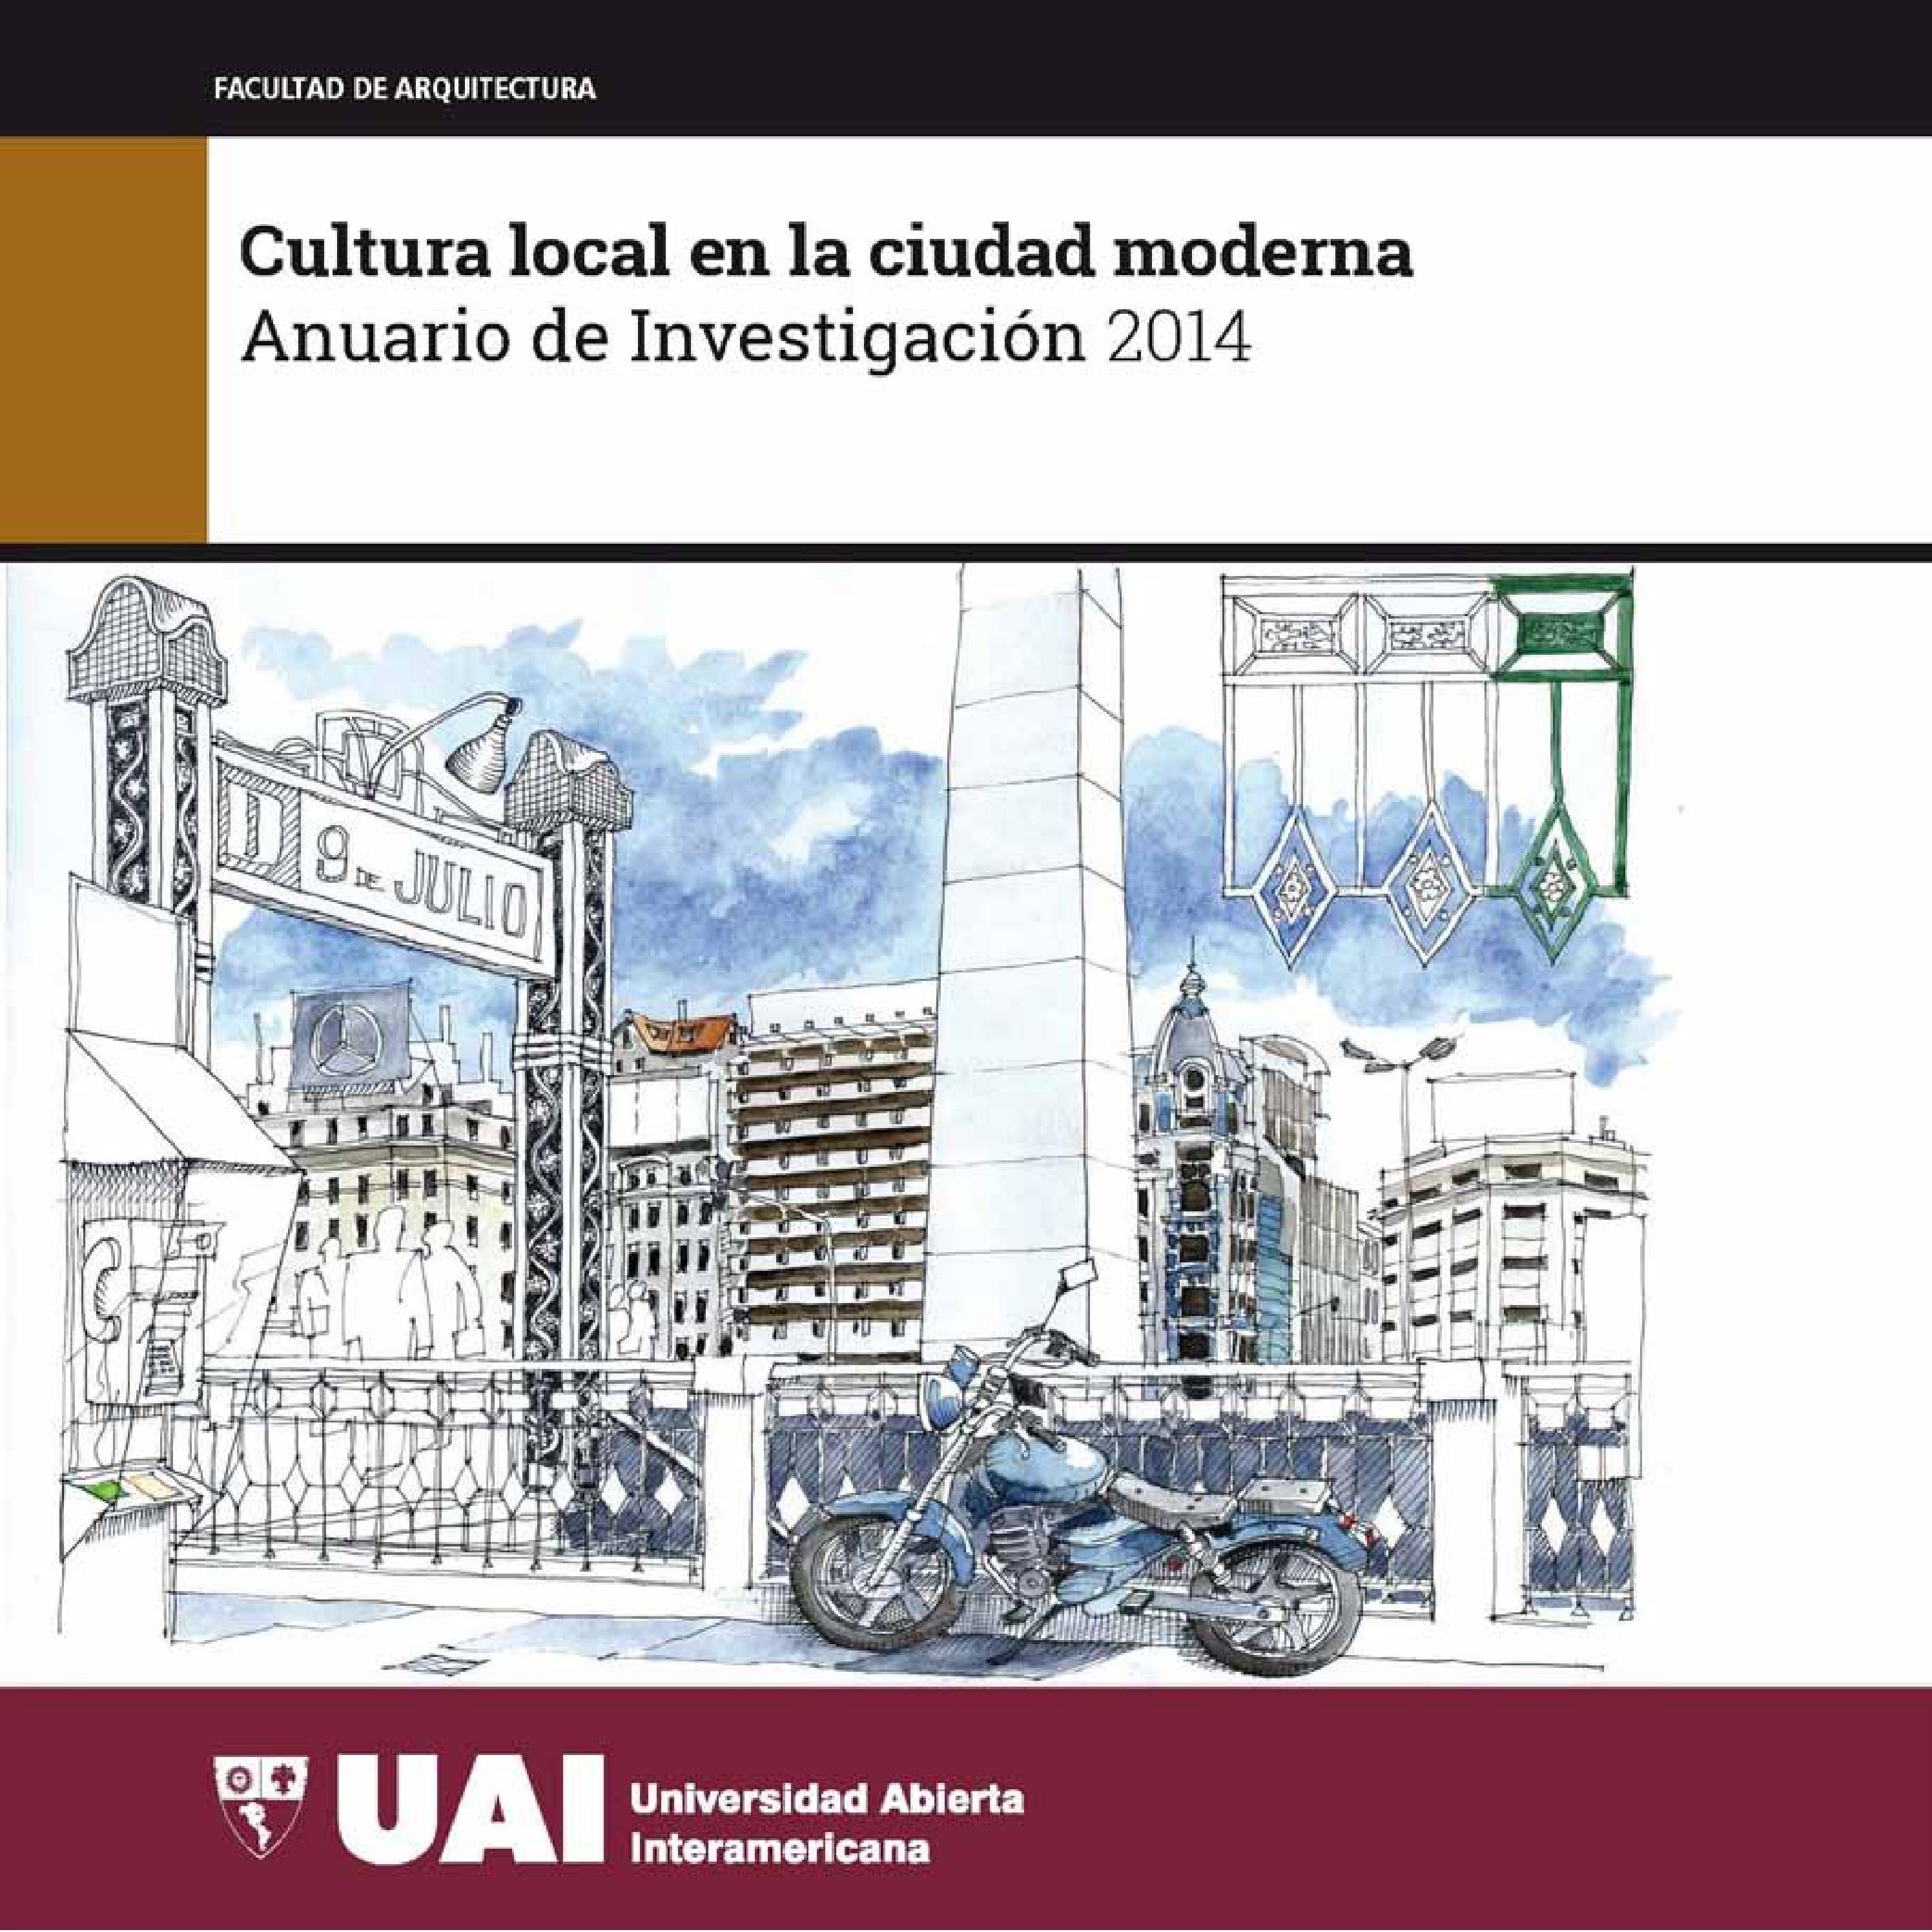 Anuario 2014 uai arq by CAEAU - issuu